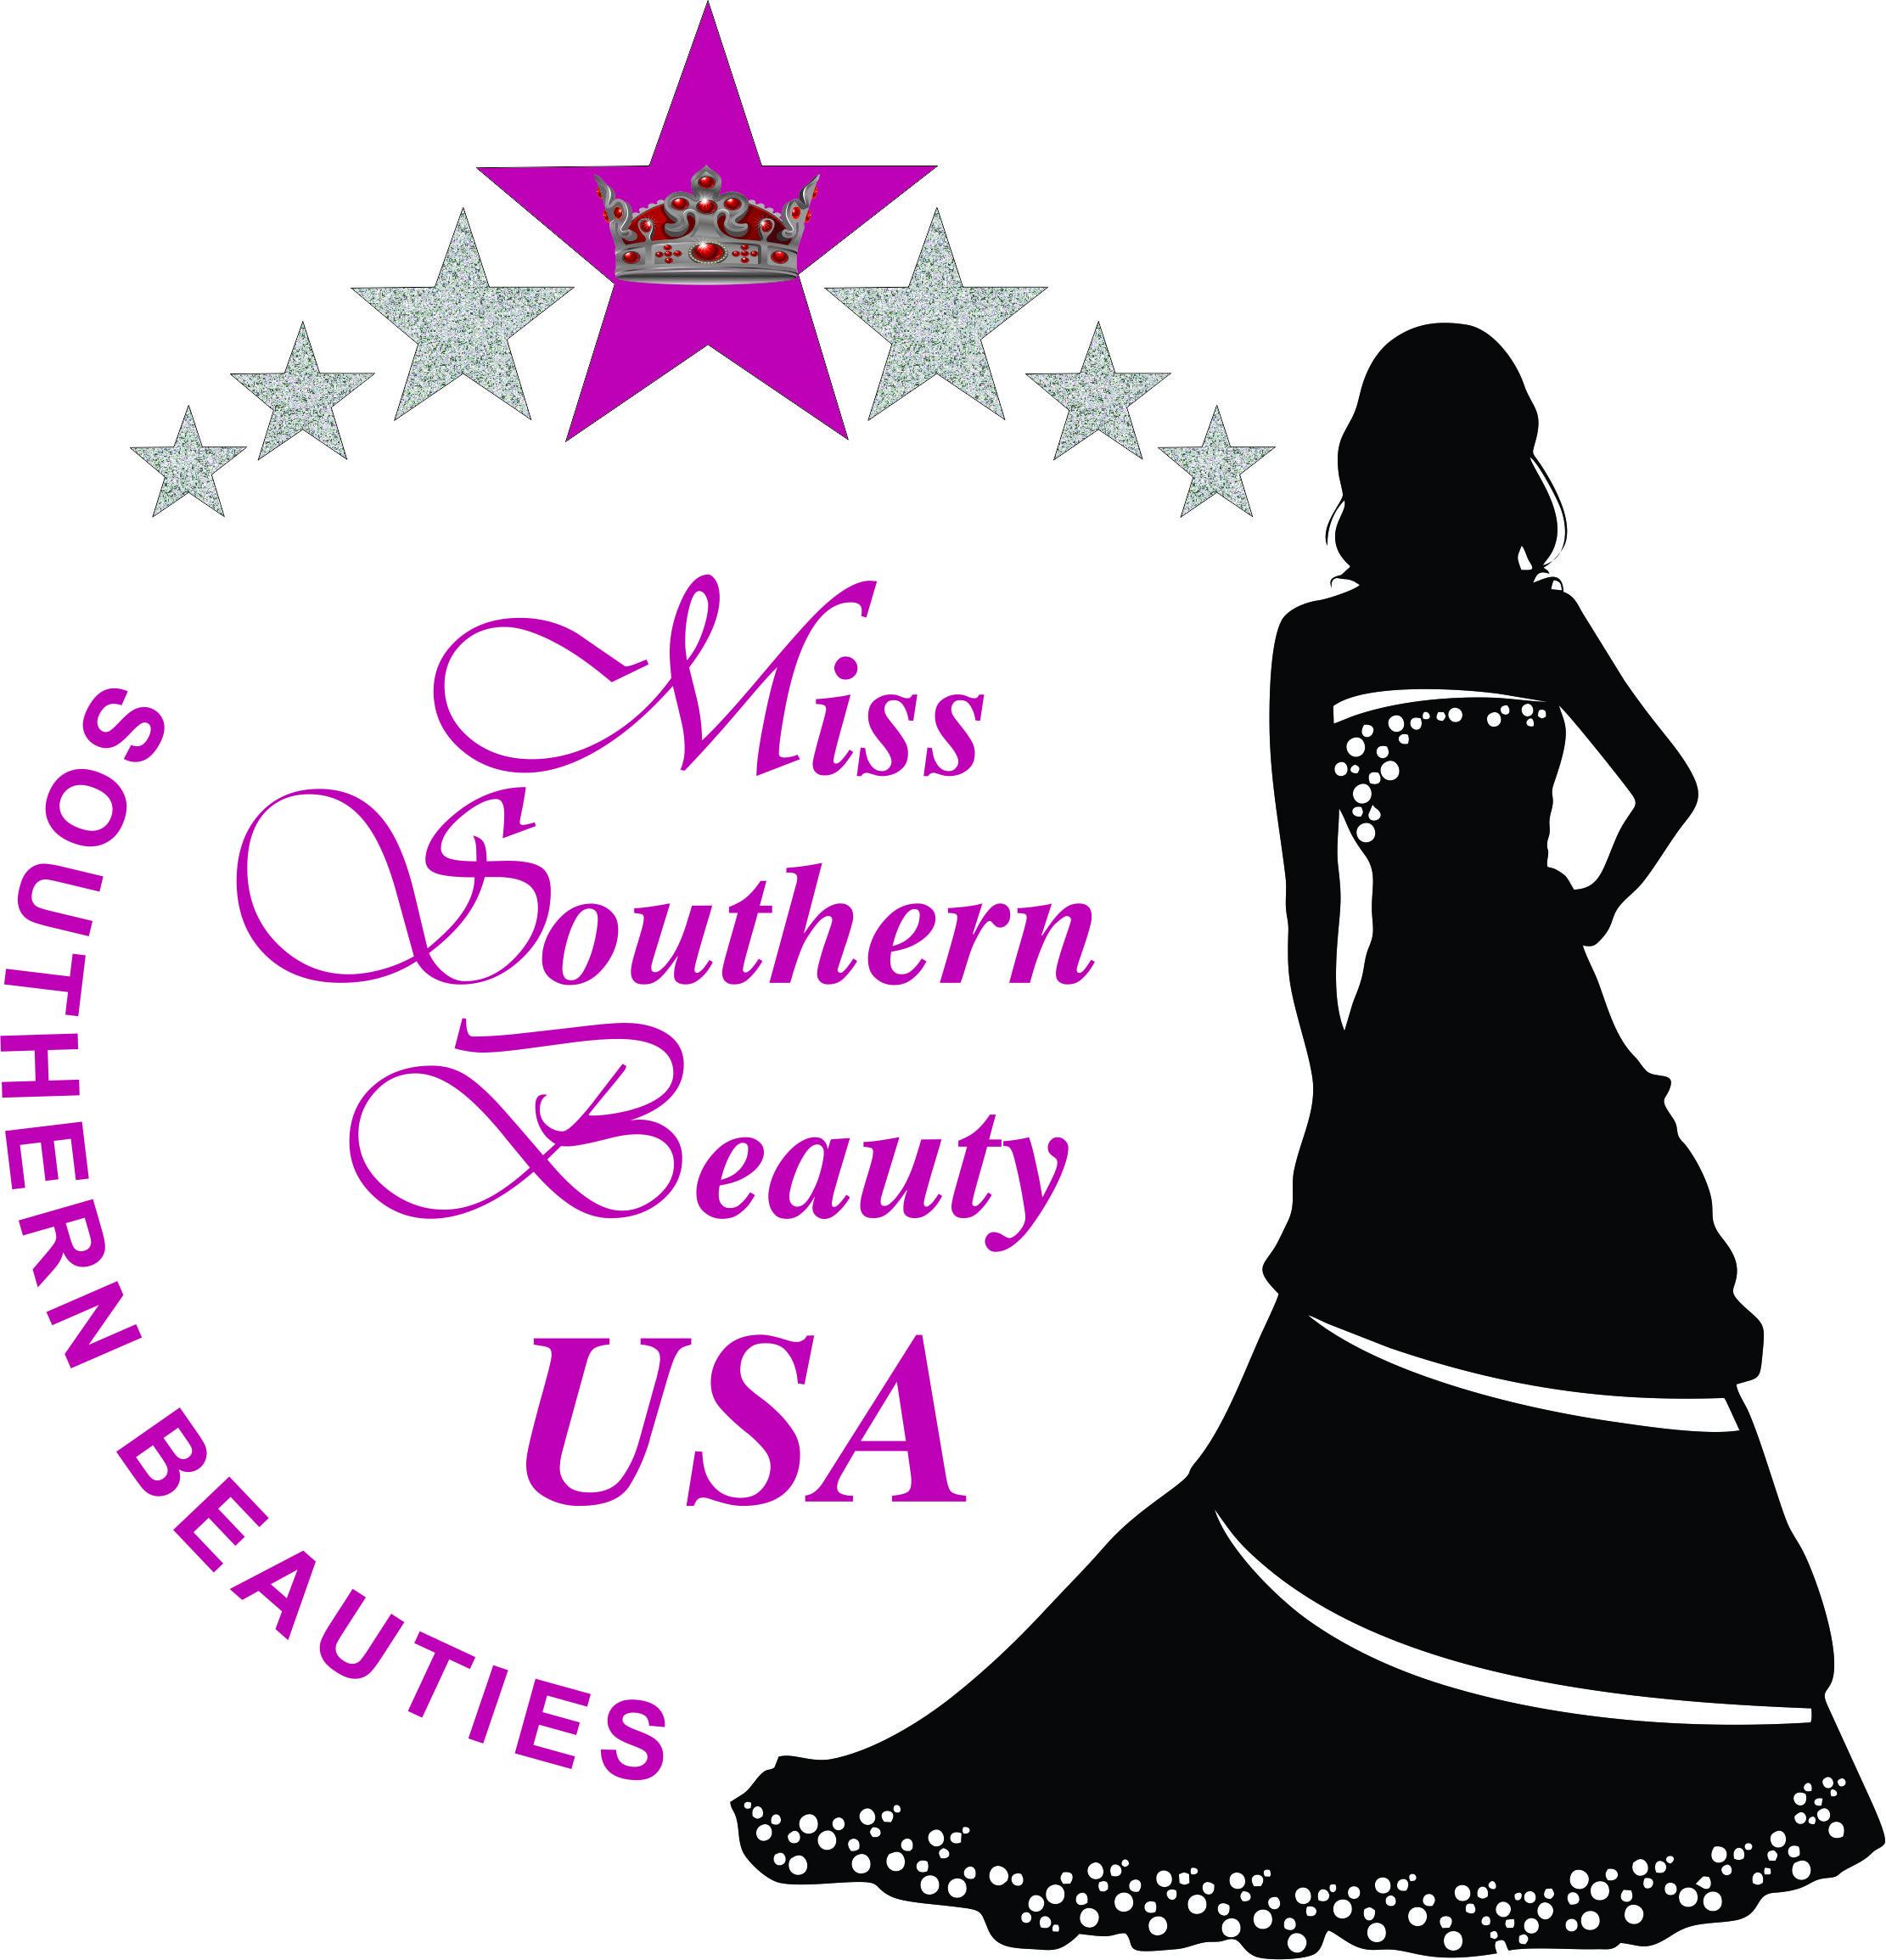 Beauty pageant logo - photo#11